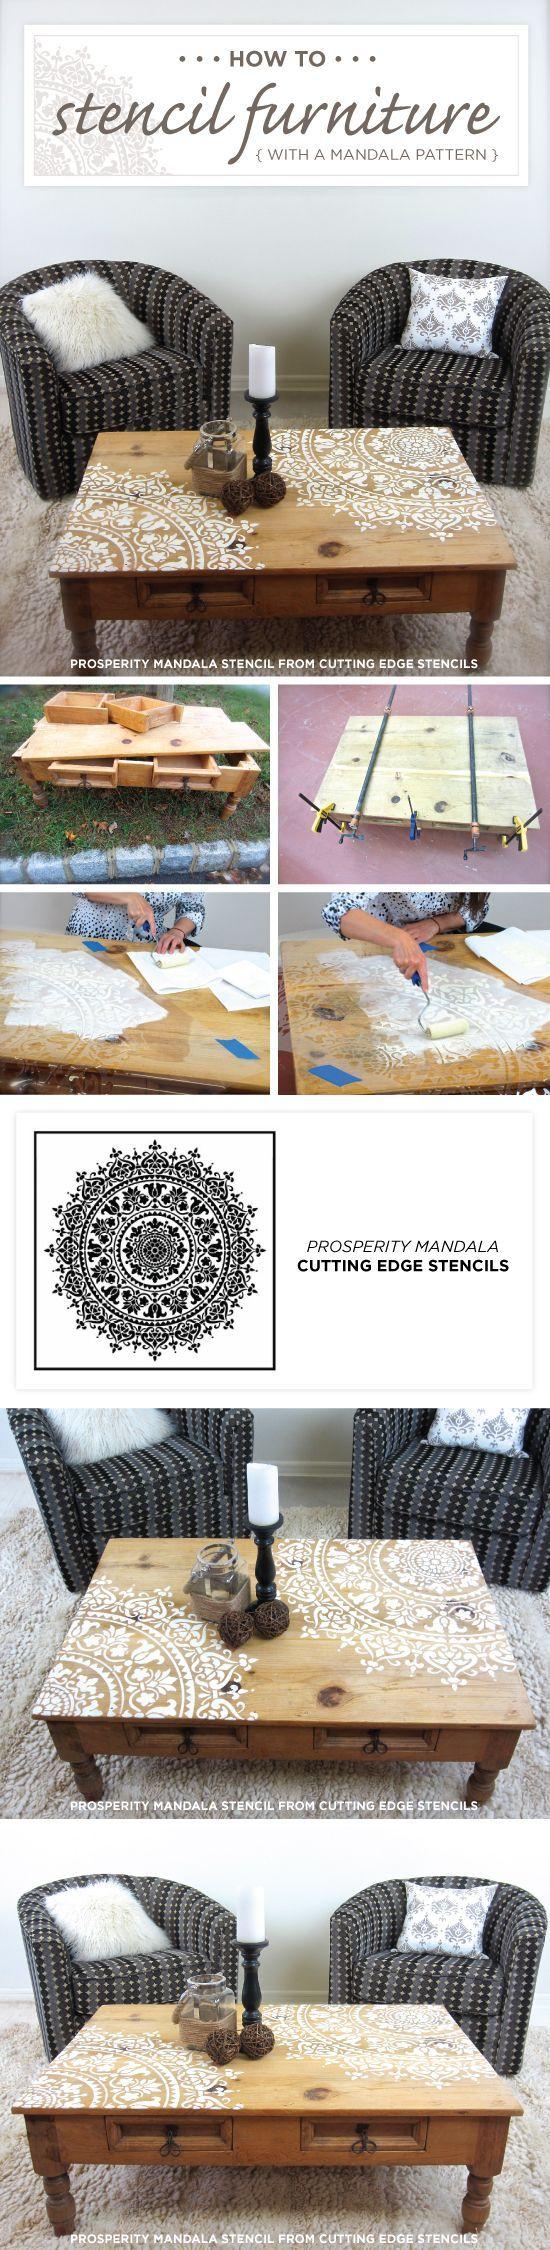 Cutting Edge Stencils shares how to stencil a wood table using the Prosperity Mandala Stencil pattern. http://www.cuttingedgestencils.com/prosperity-mandala-stencil-yoga-mandala-stencils-designs.html